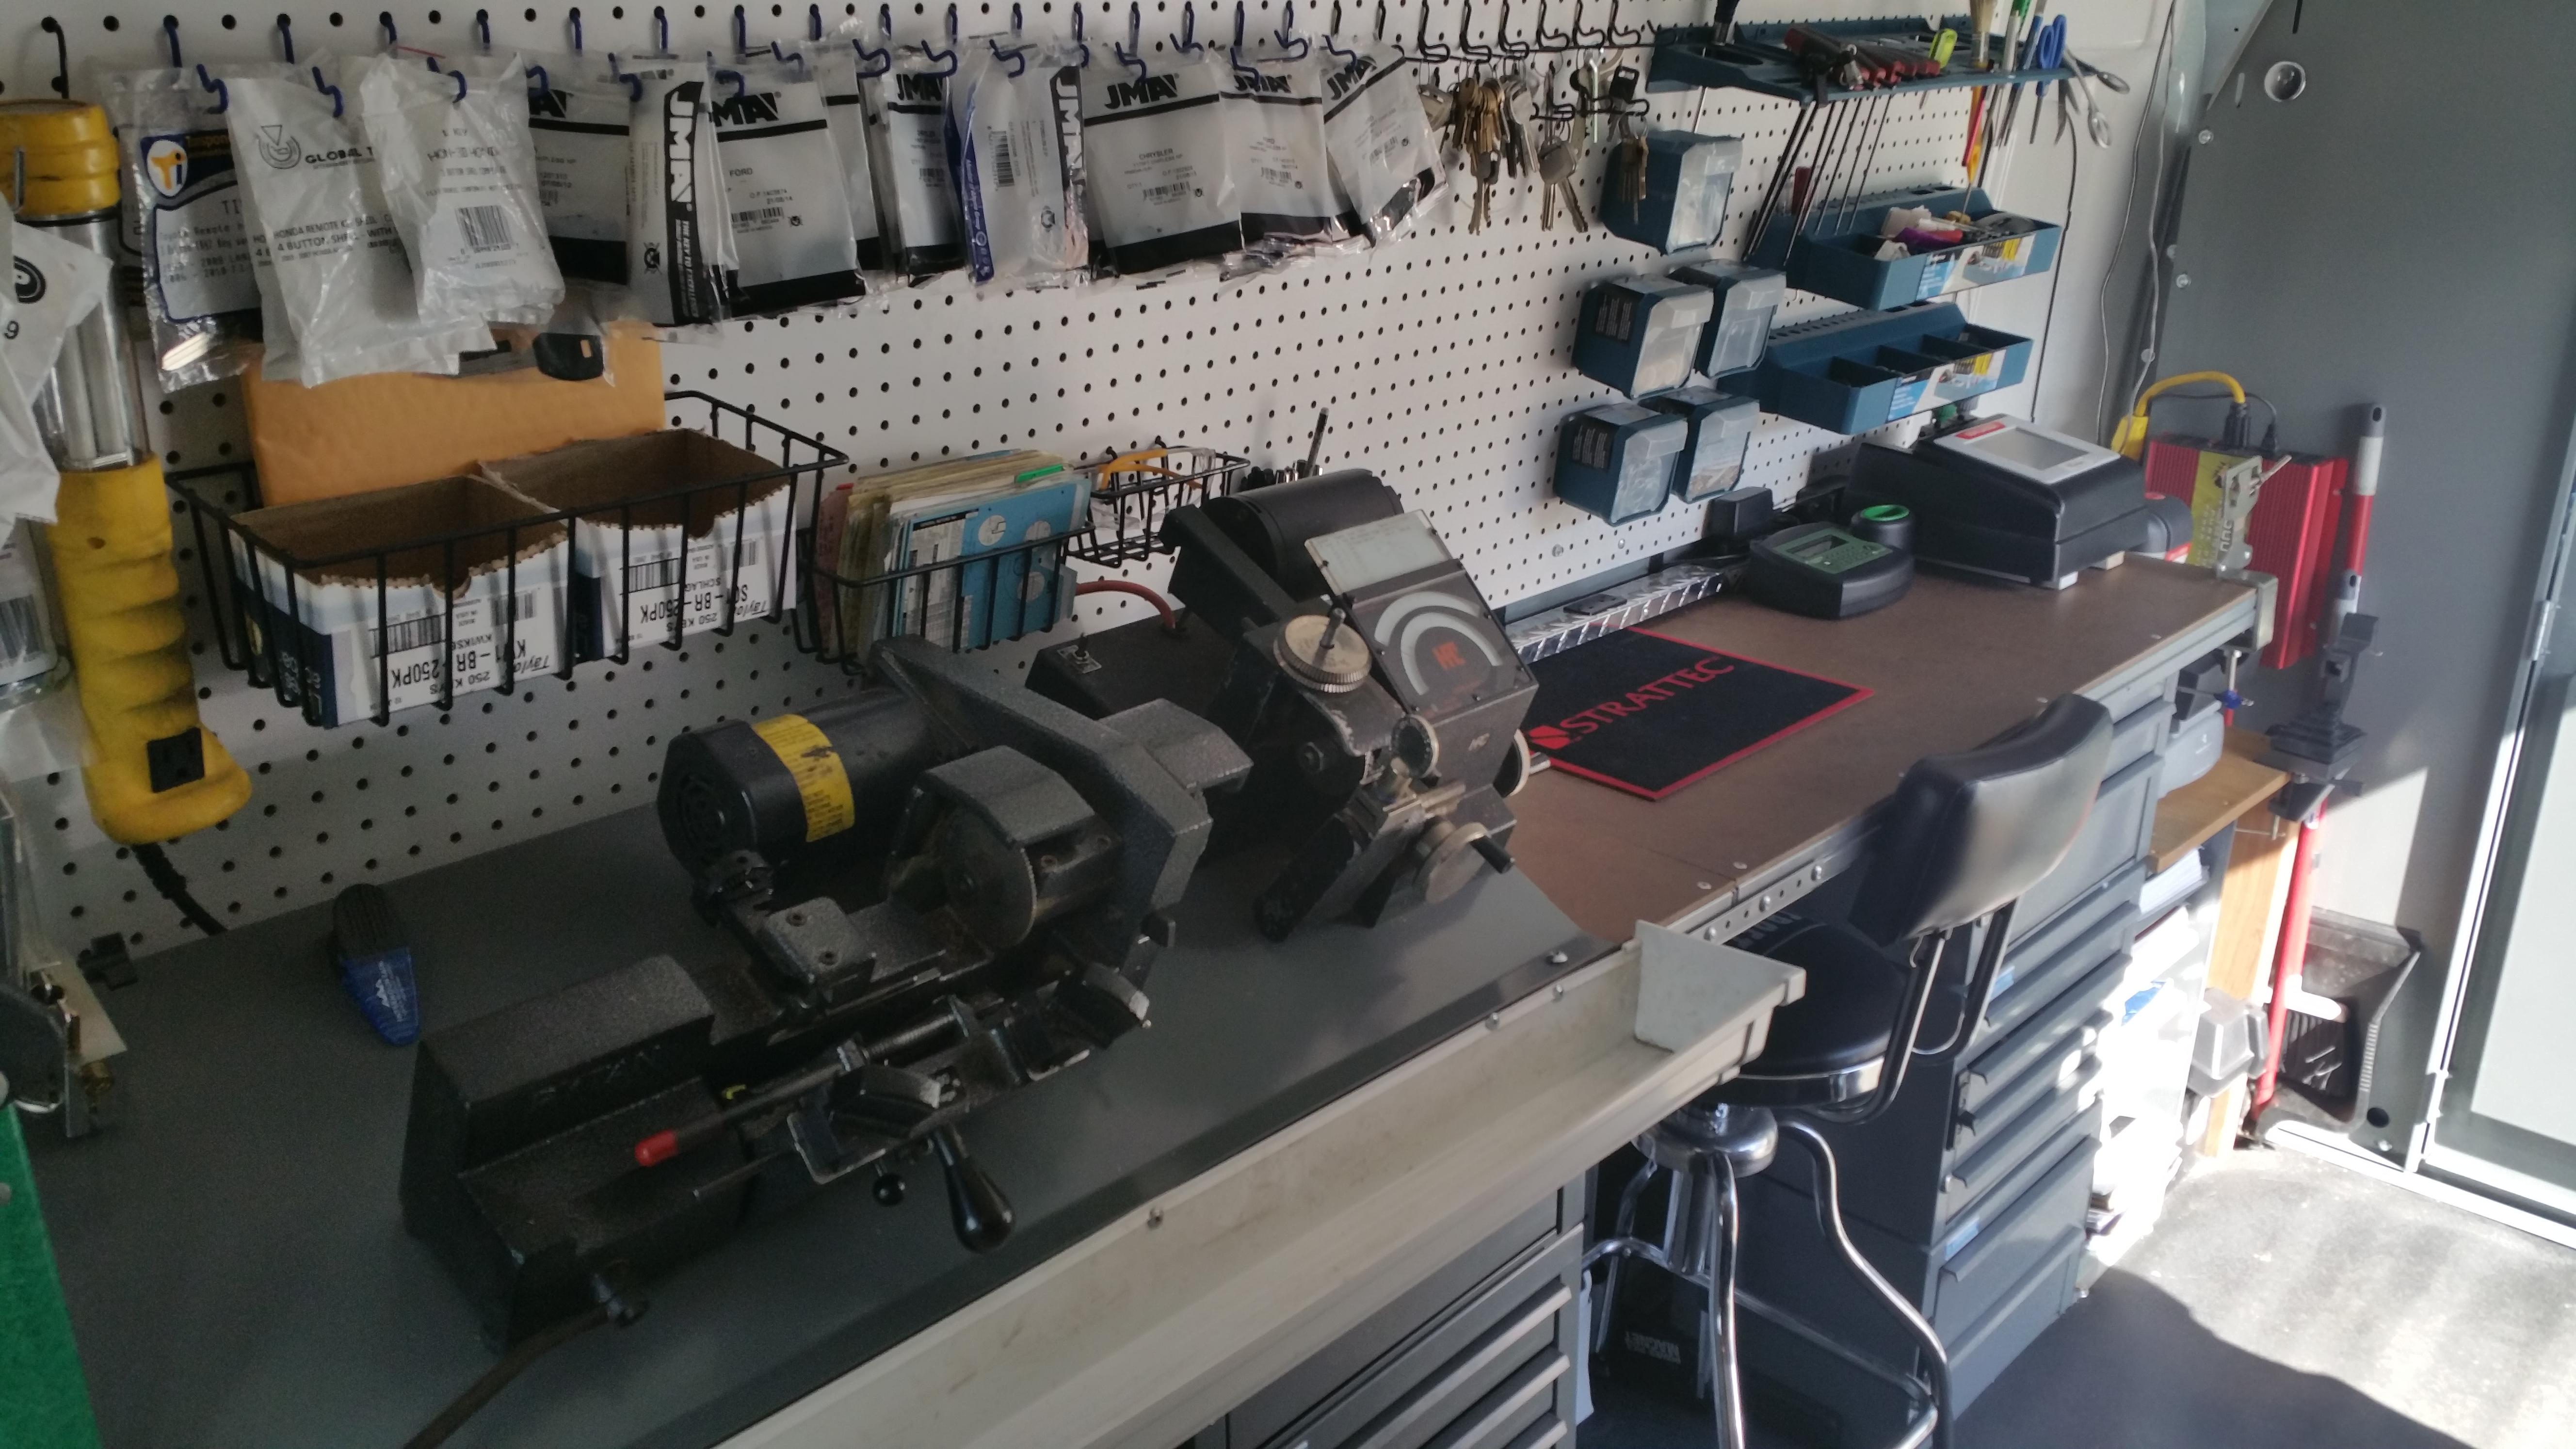 Mobile Locksmith Shop Locksmith Chico Ca